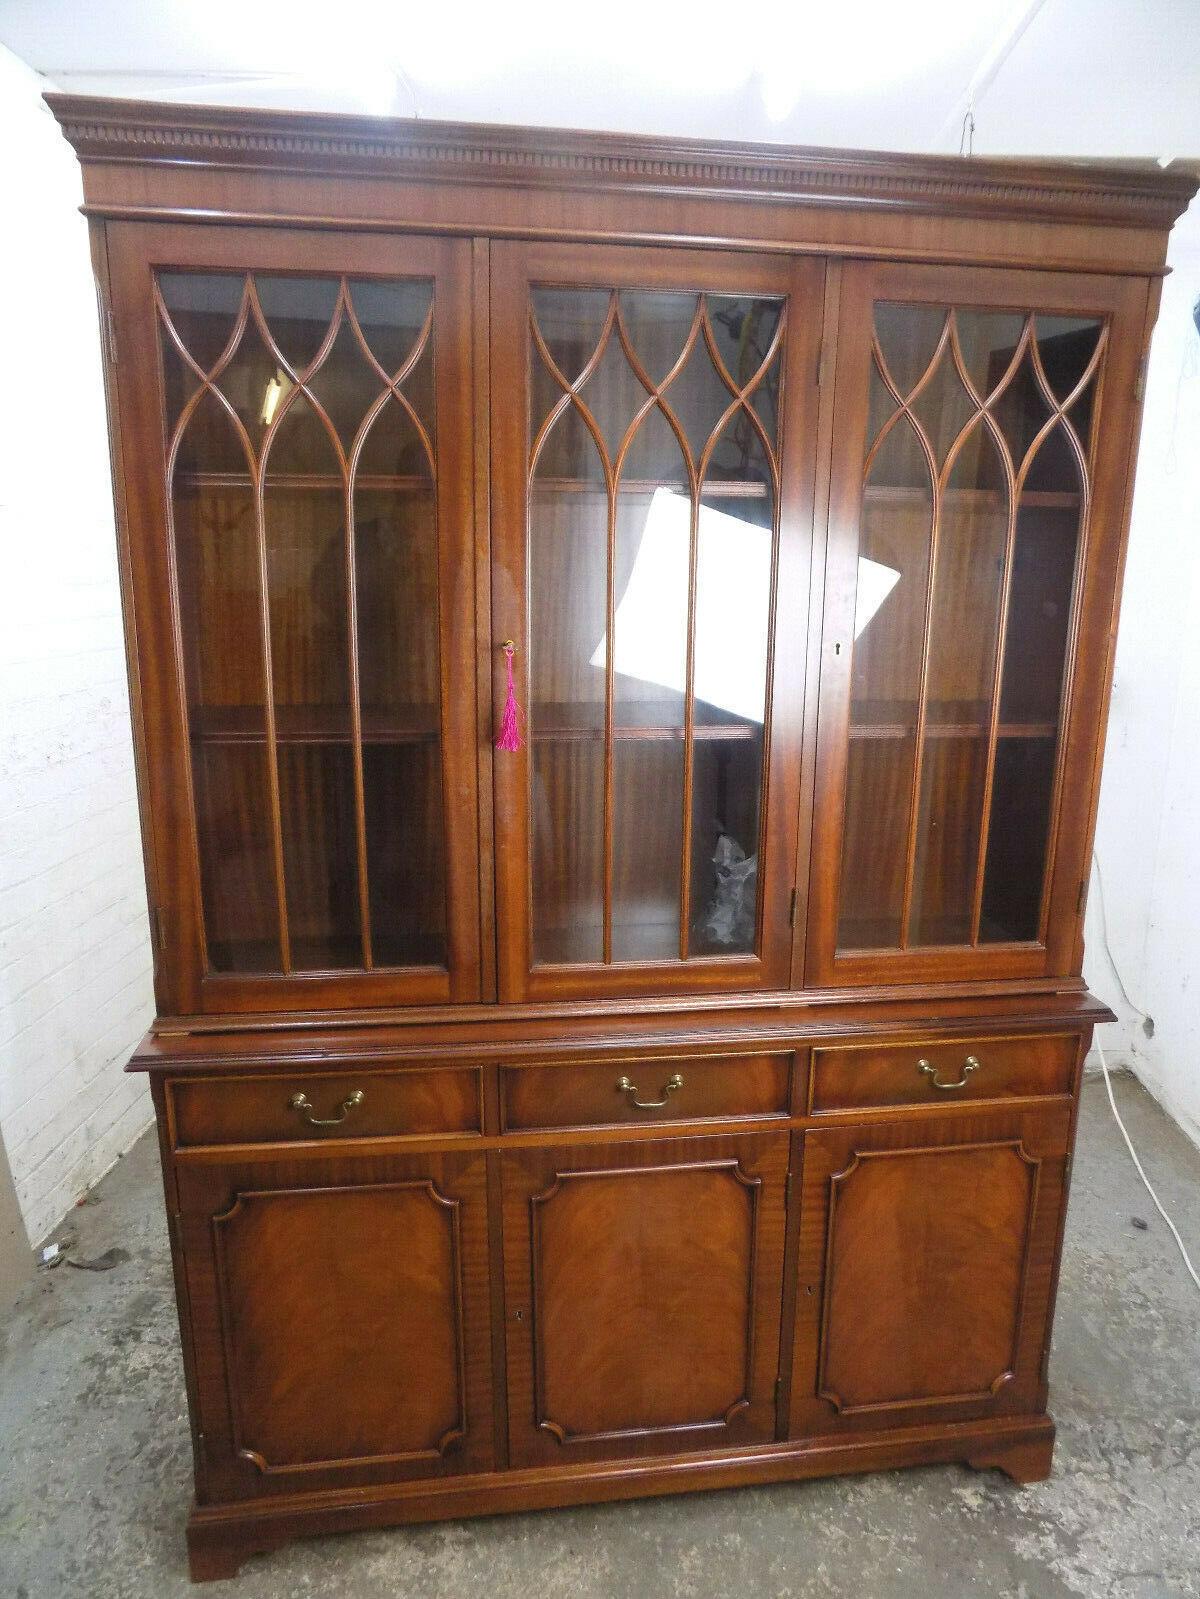 Antique Georgian Repro 6 Door Glazed Mahogany Bookcase Cupboard Shelves Drawers